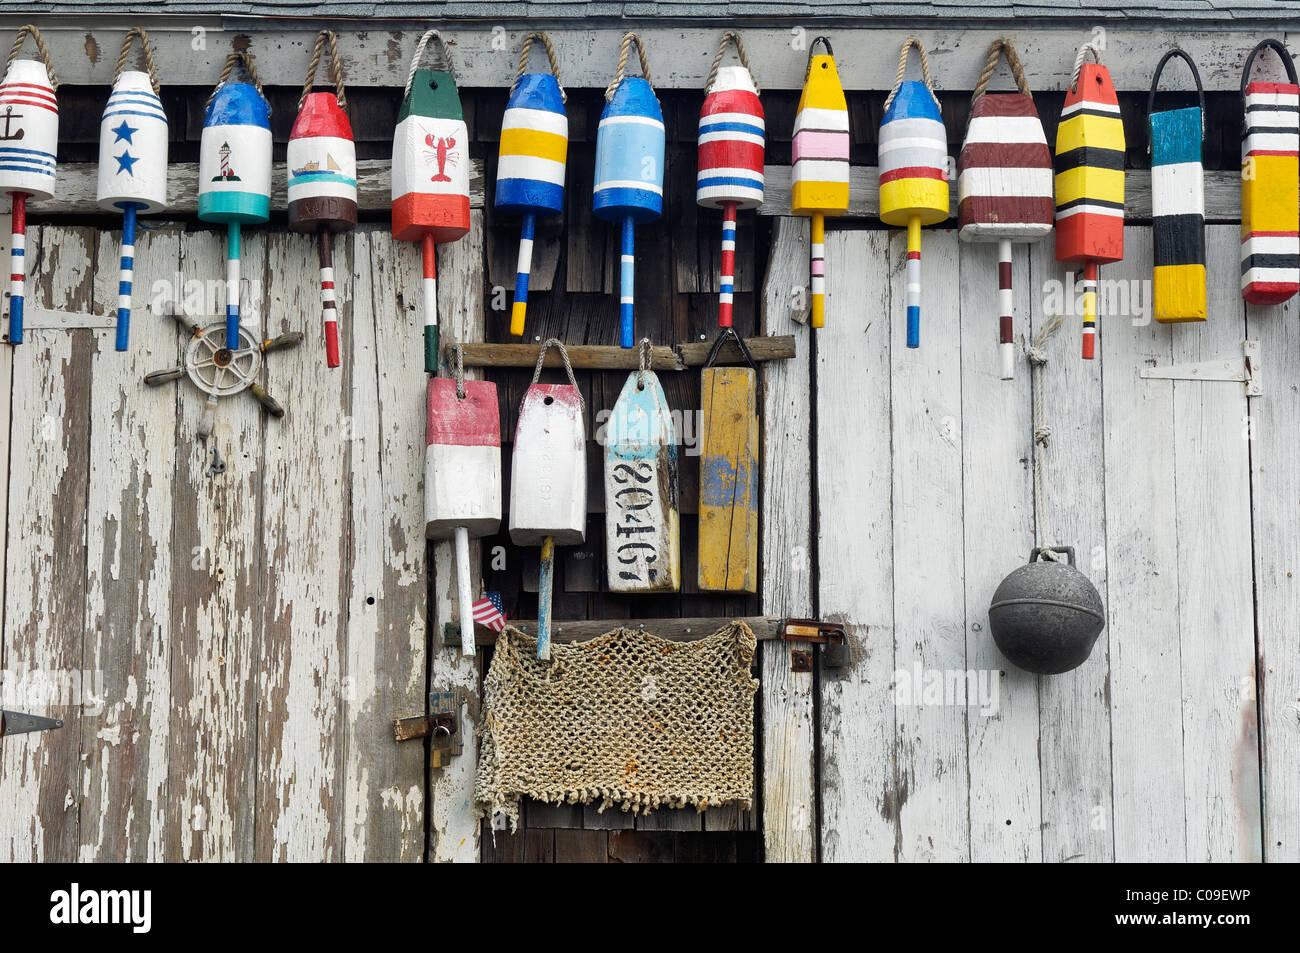 Lobster Buoys on Old Fishing Shack in Rockport, Massachusetts - Stock Image